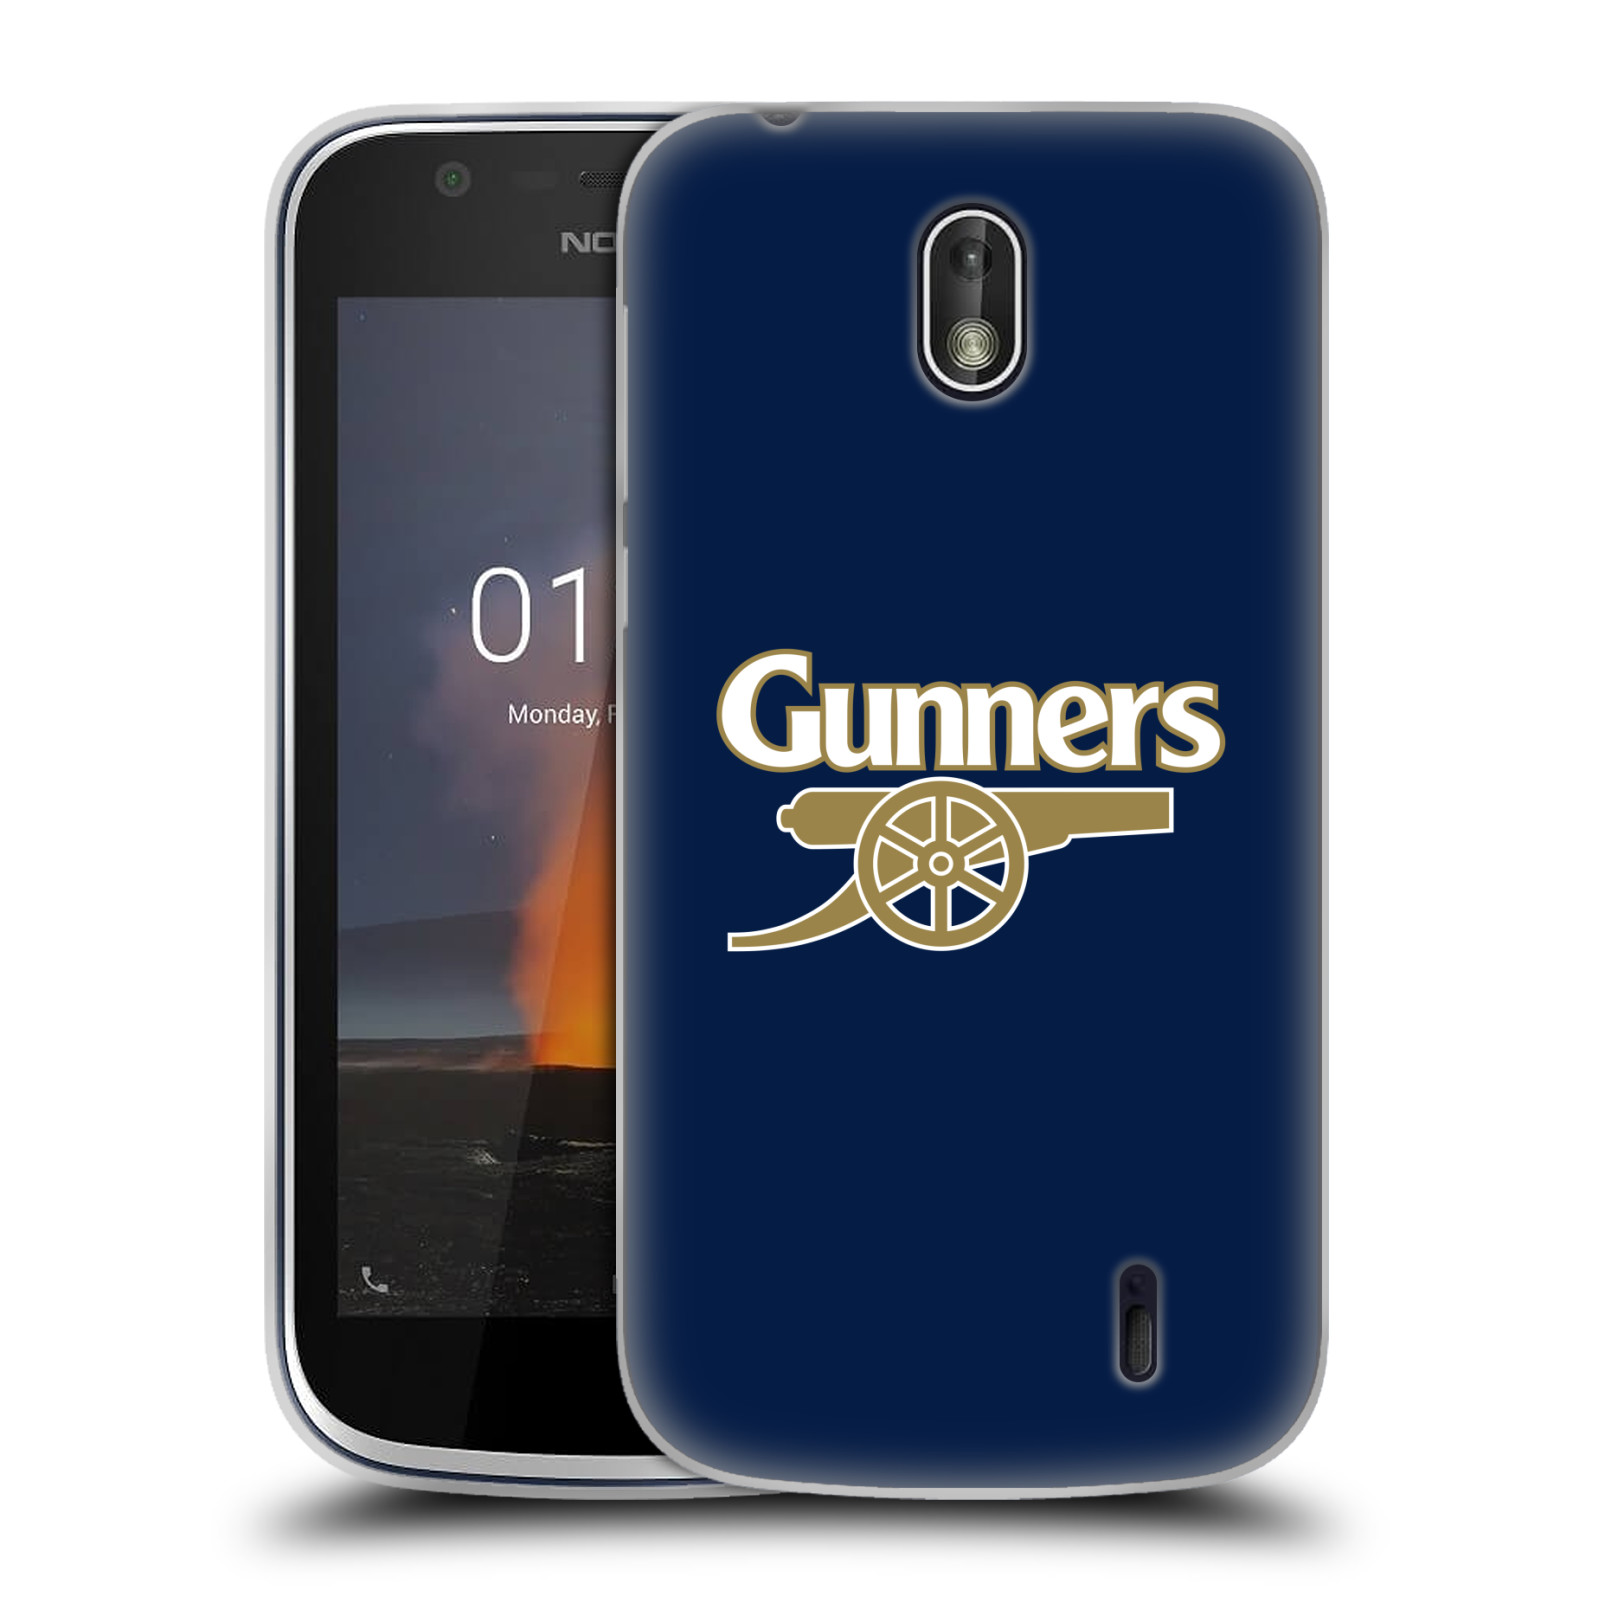 Silikonové pouzdro na mobil Nokia 1 - Head Case - Arsenal FC - Gunners